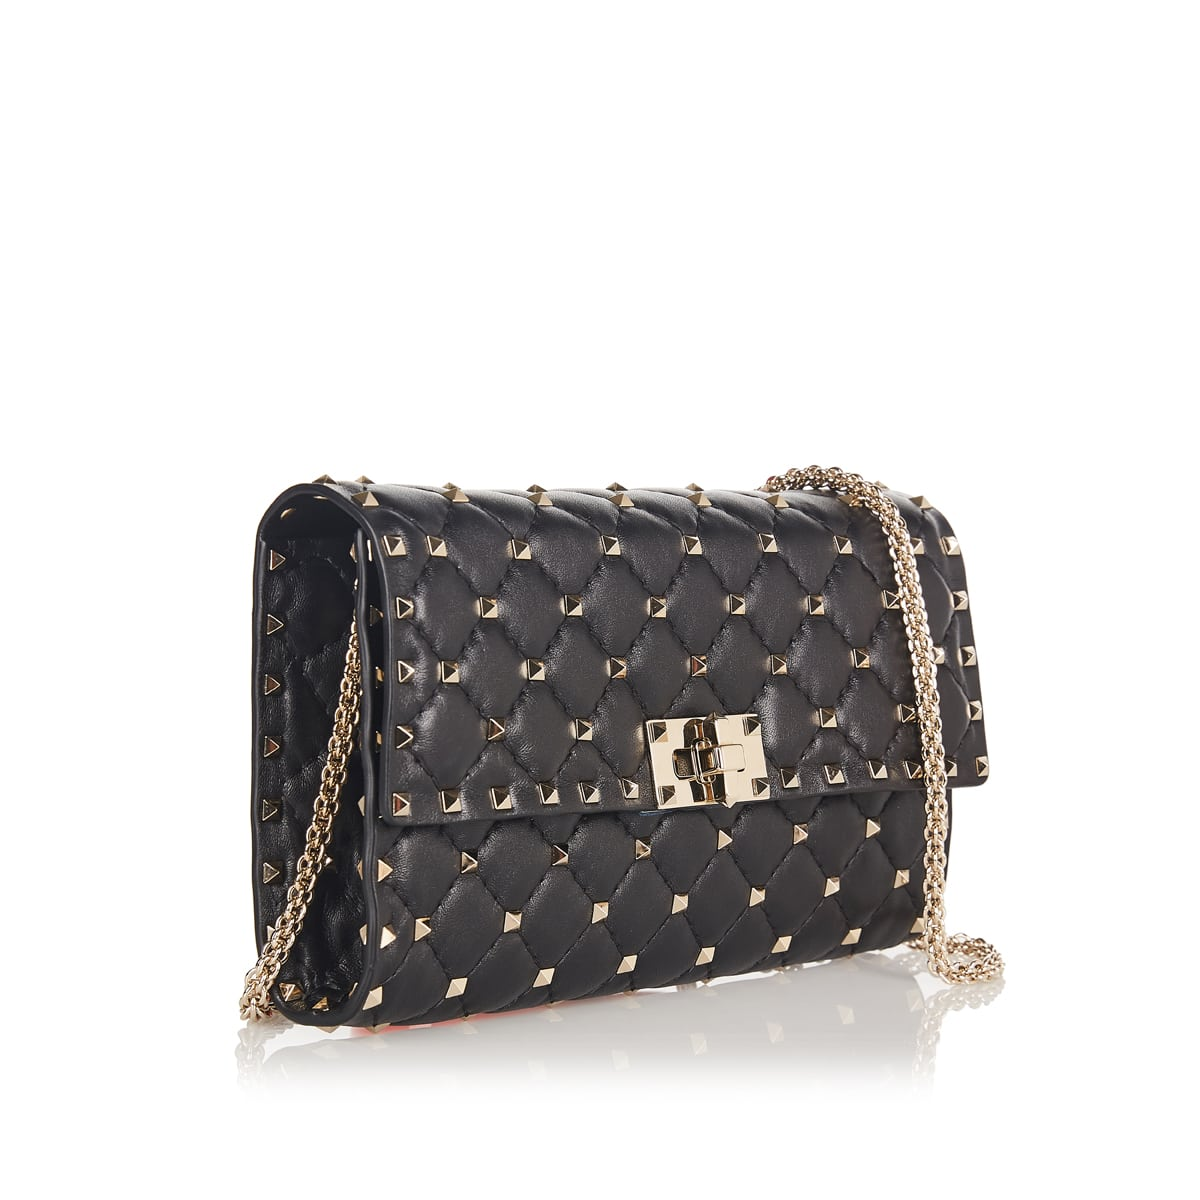 Rockstud Spike chain bag